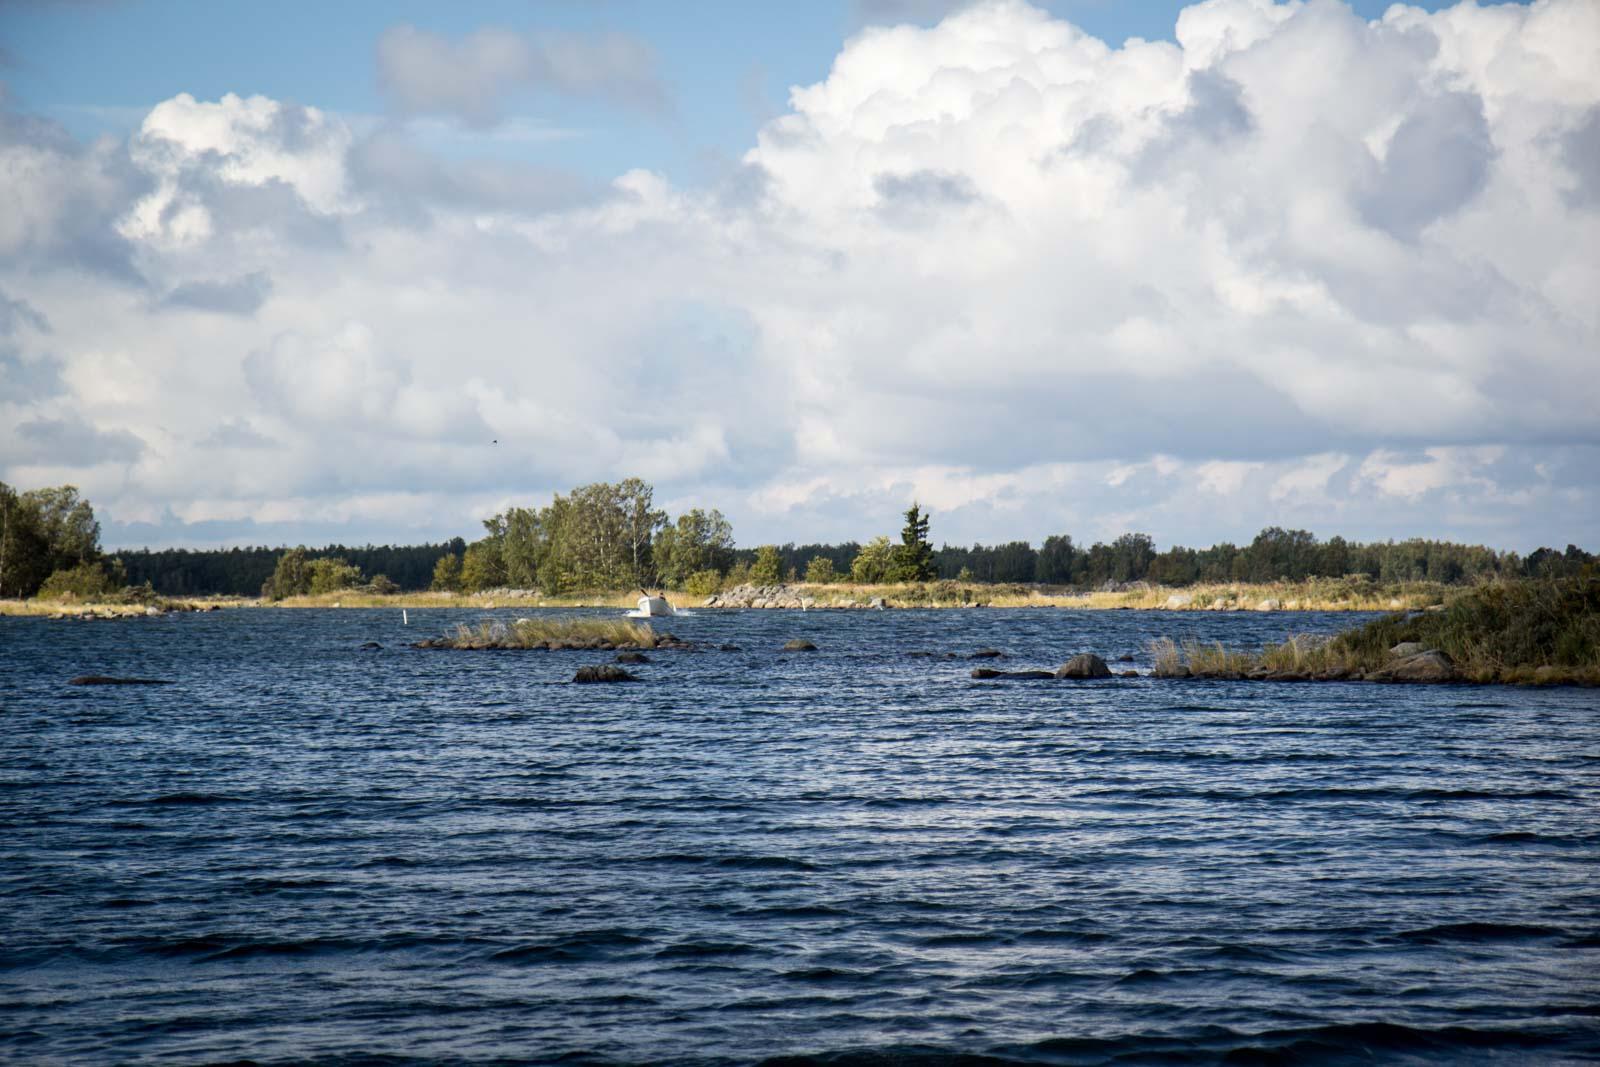 Kvarken Archipelago, Finland